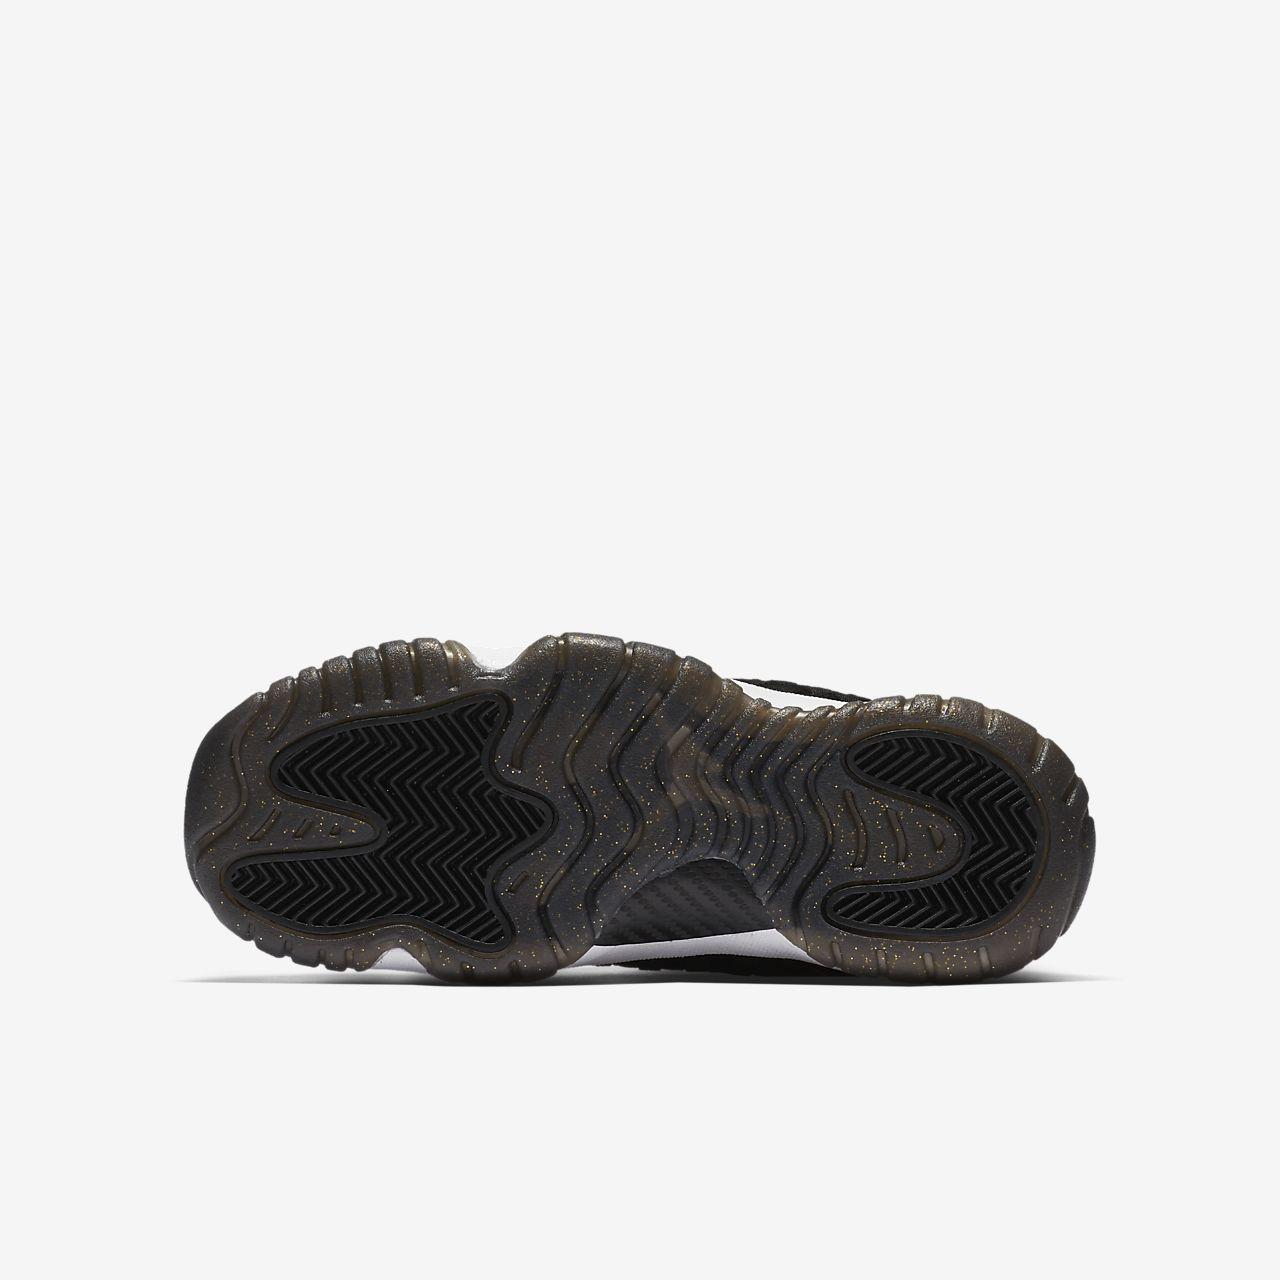 jordan shoes boys 6.5y black and gold nz